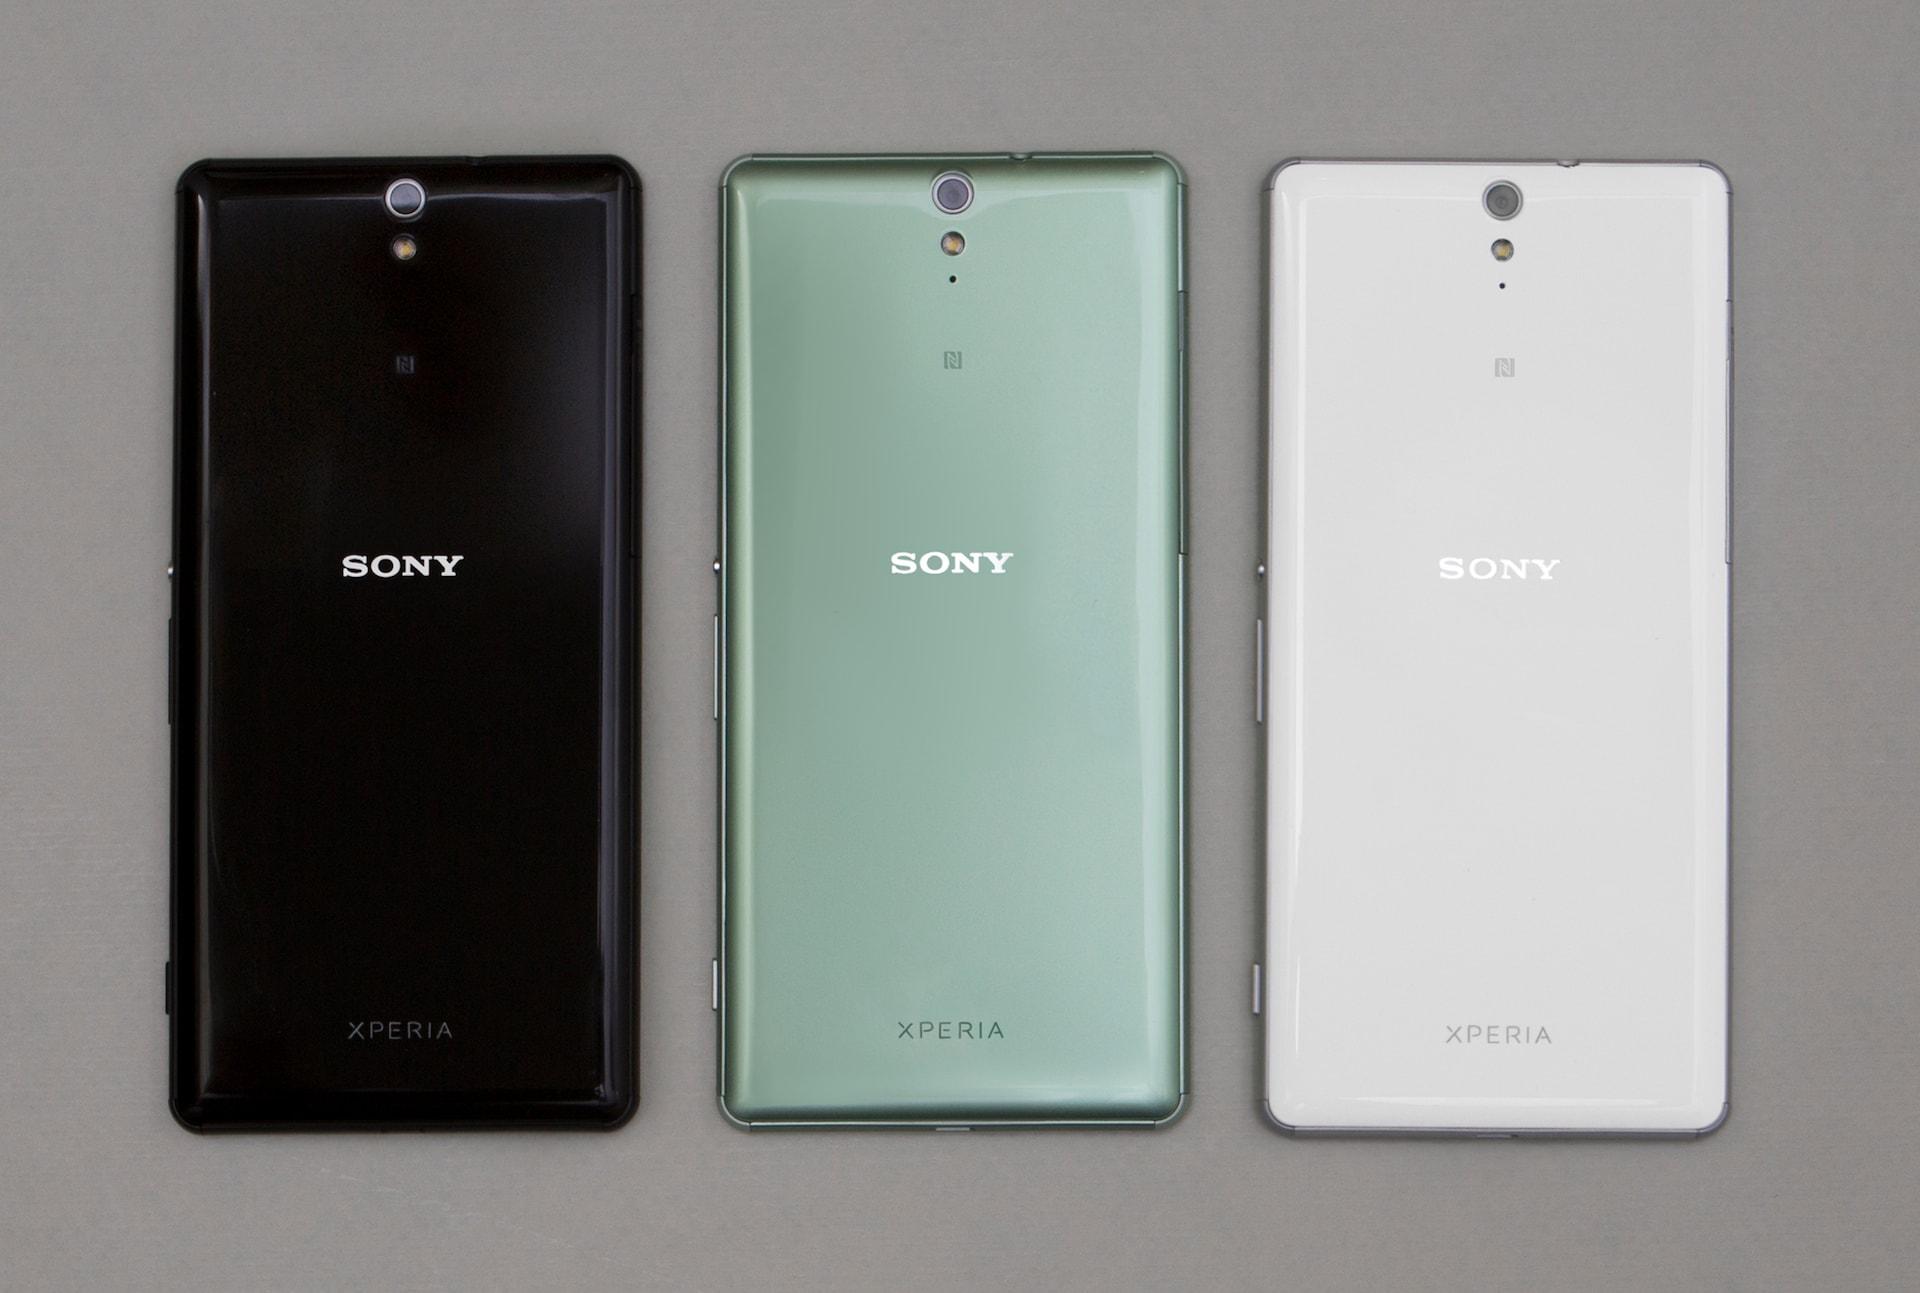 Sony Xperia C5 Ultra render ufficiale – 4